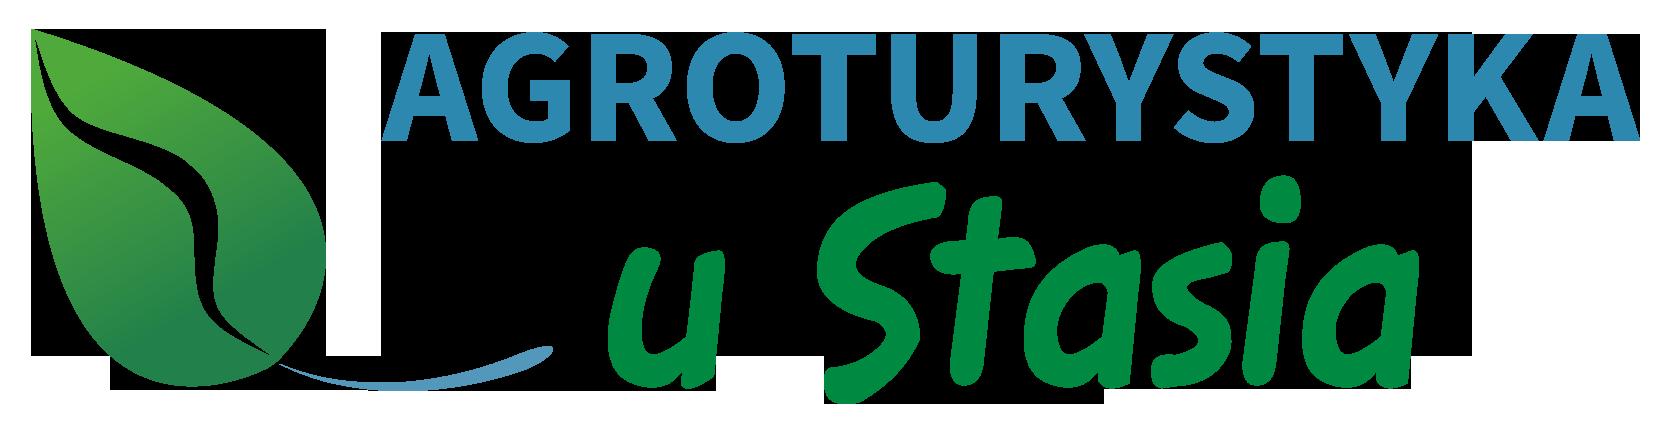 Agroturystyka u Stasia